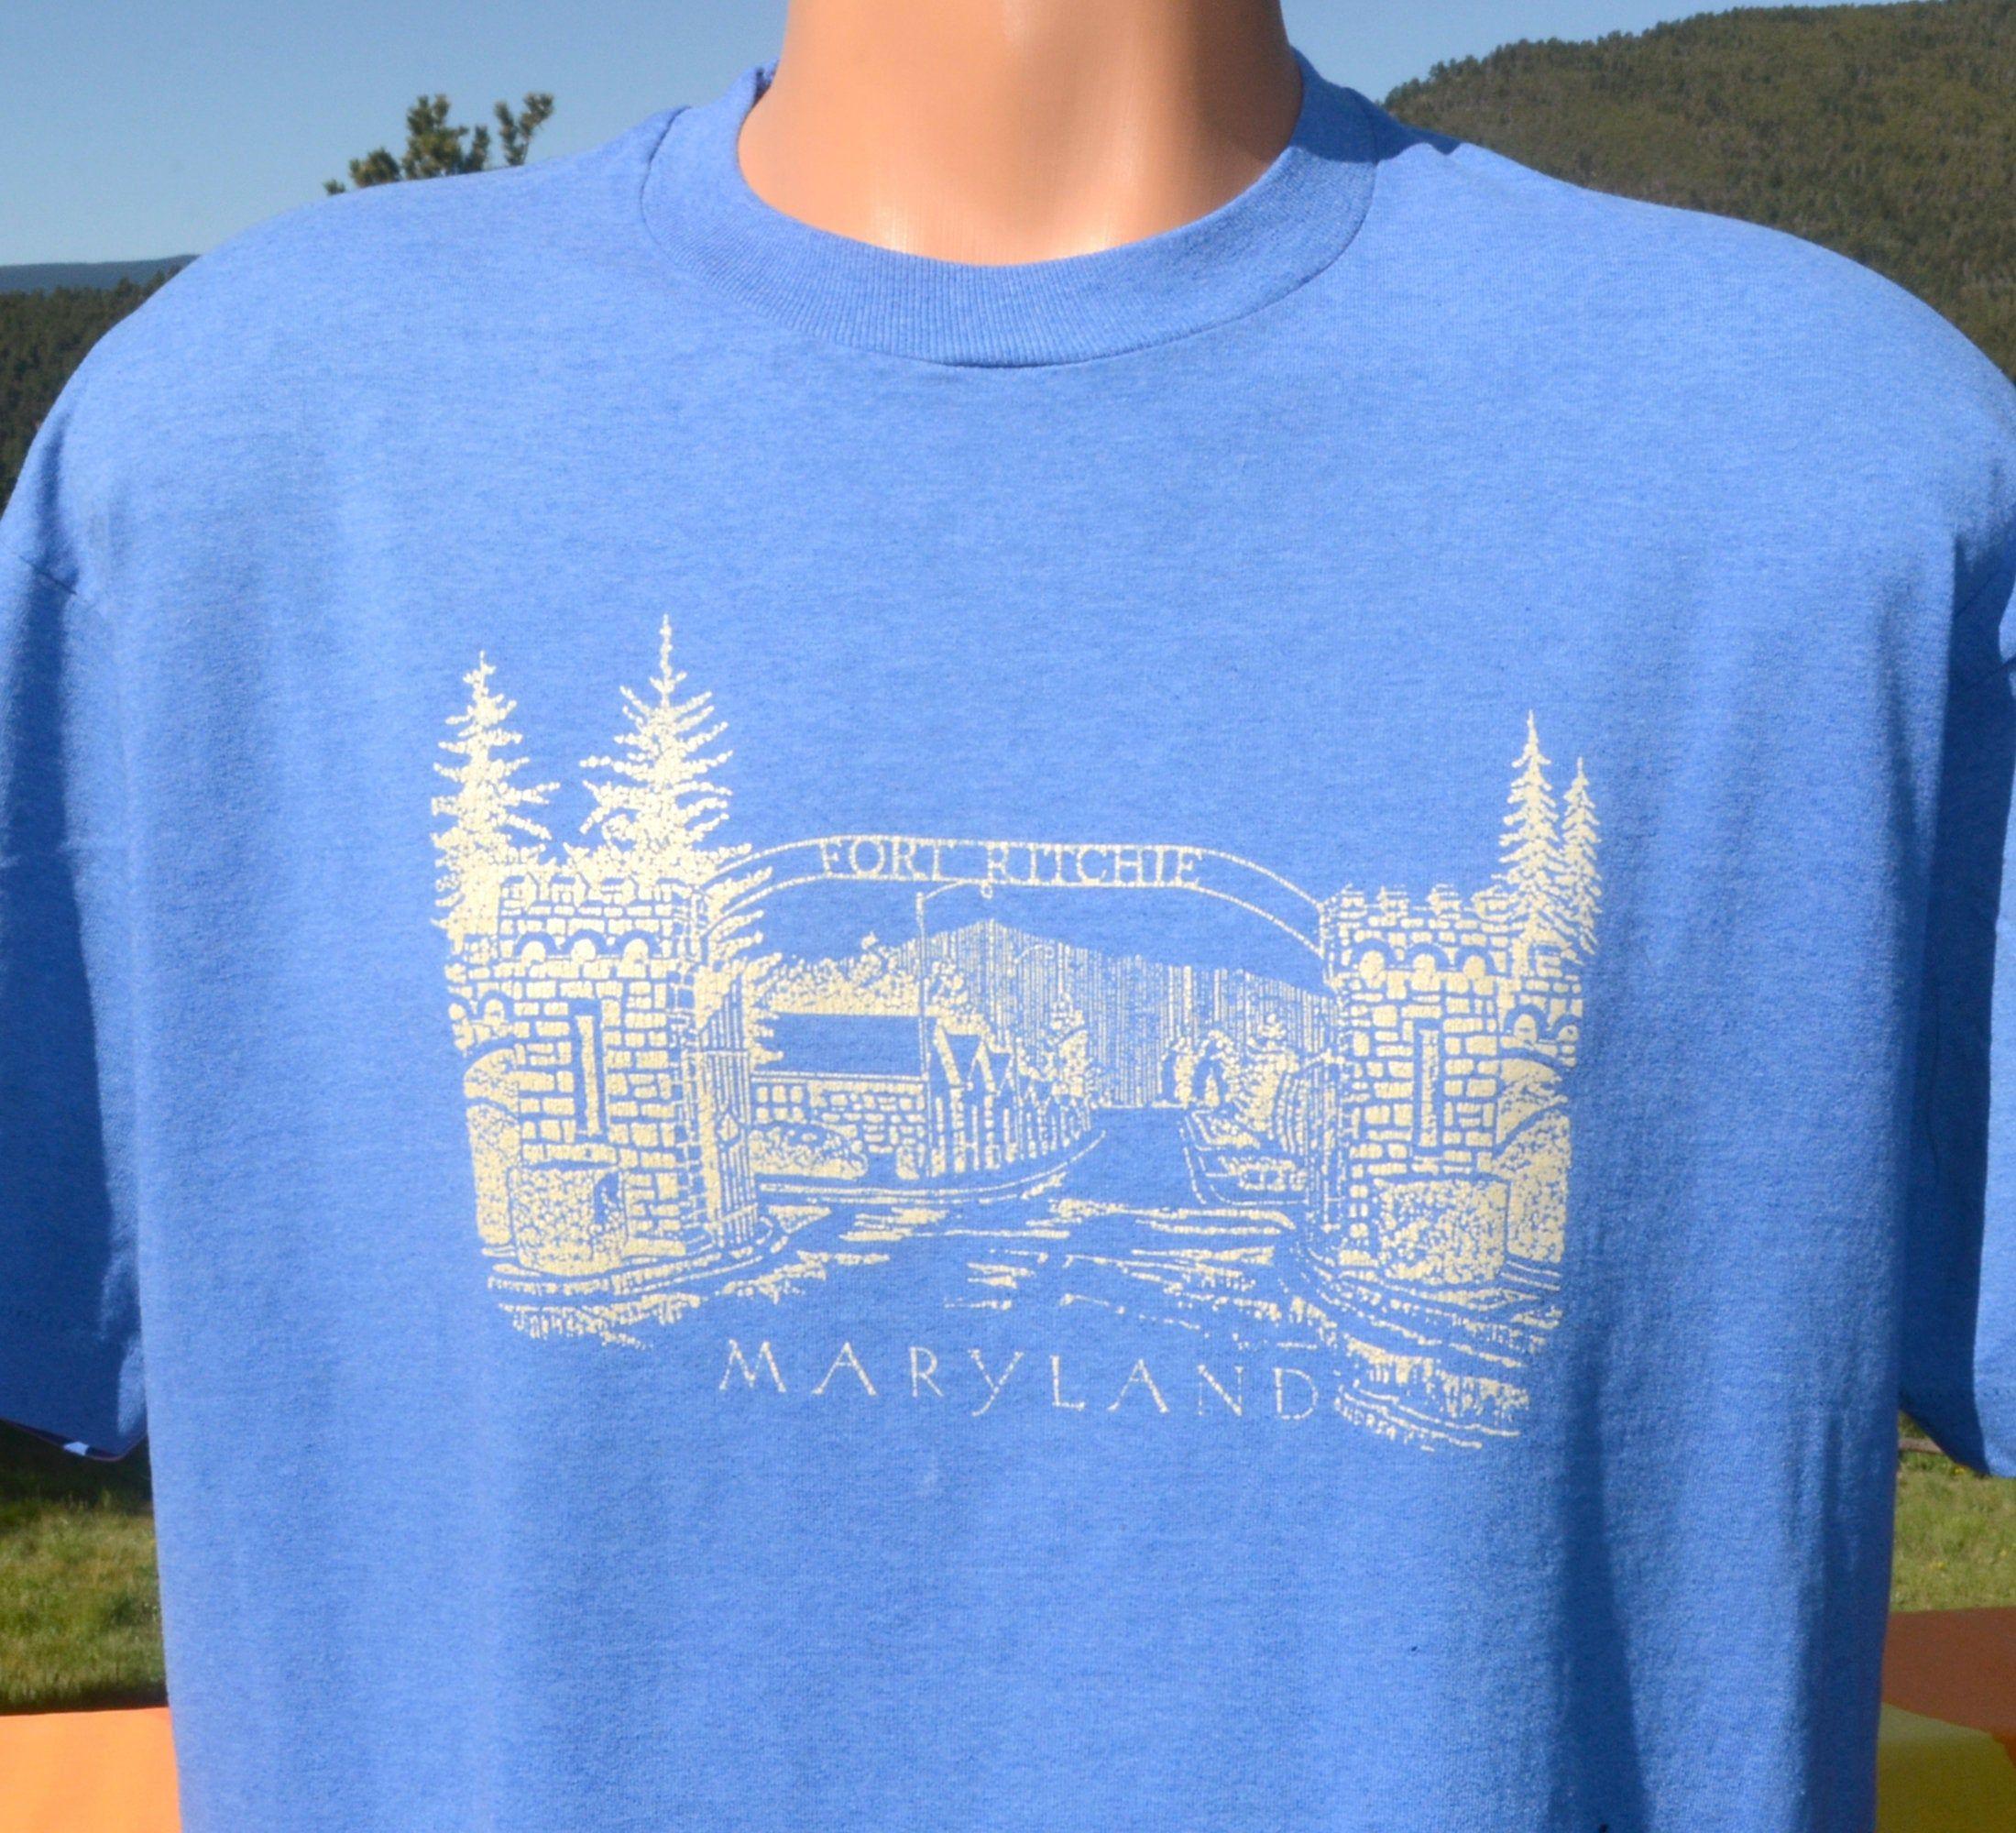 Vintage 80s T Shirt Fort Ritchie Maryland Tee Xl Large Military Shirts T Shirt 80s Sweatshirt [ 2000 x 2200 Pixel ]